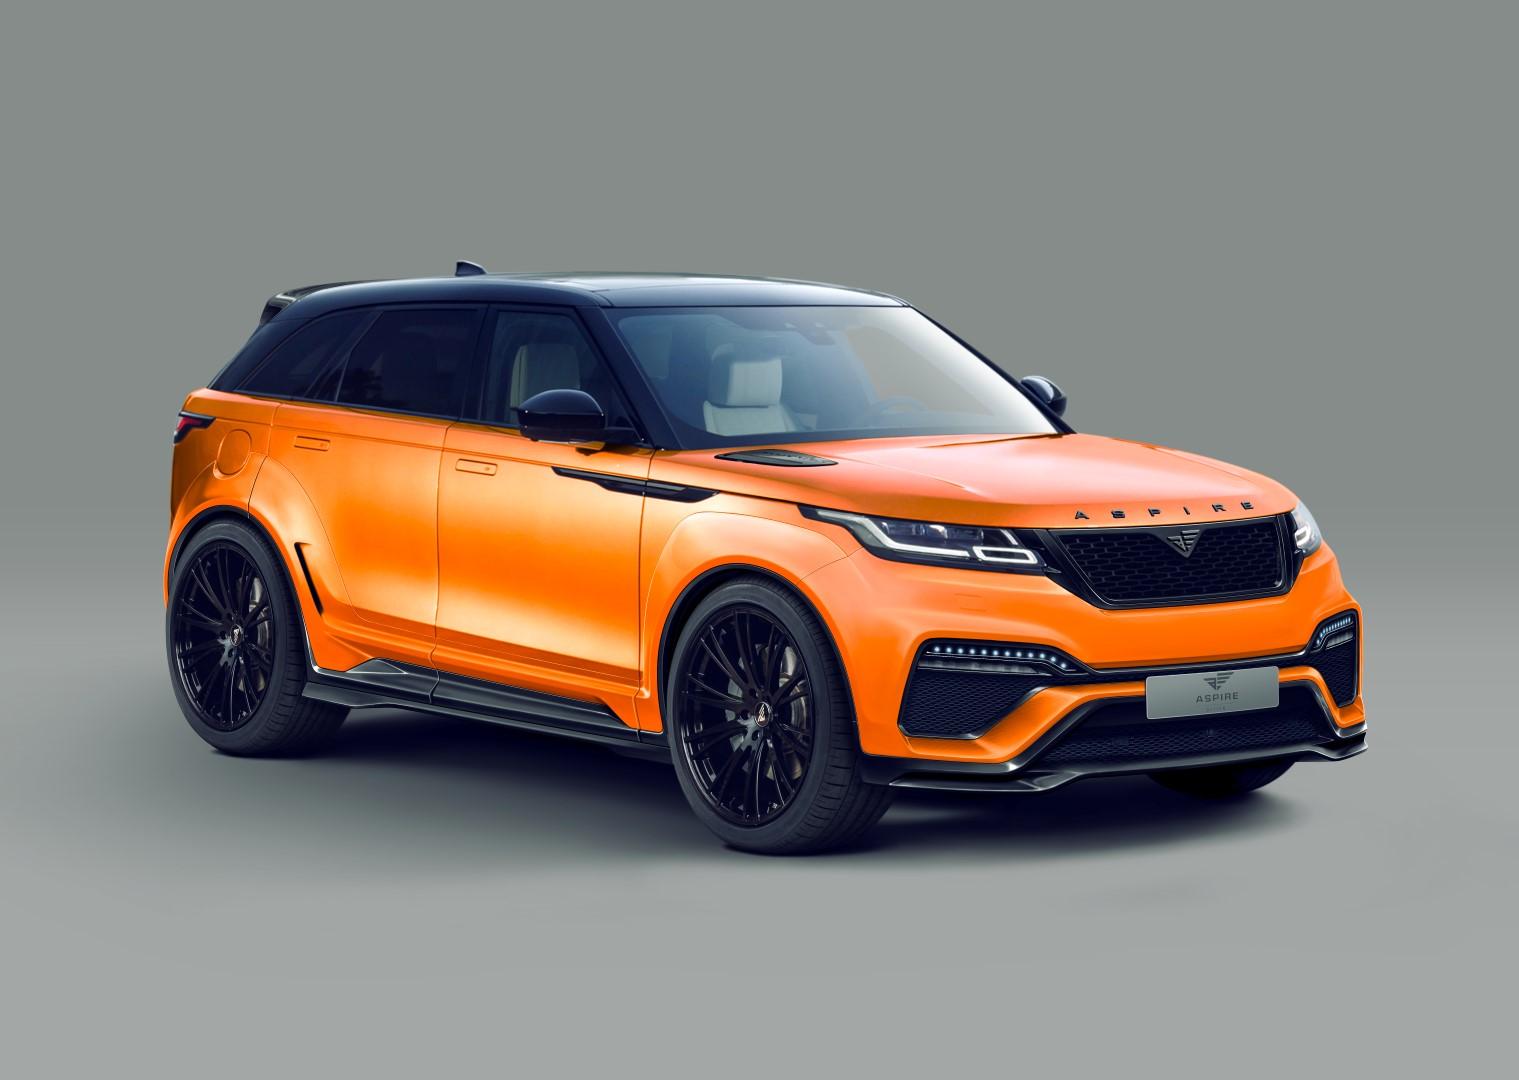 Wide Body Hellcat >> Wide Body Range Rover Velar Thanks To Aspire Design